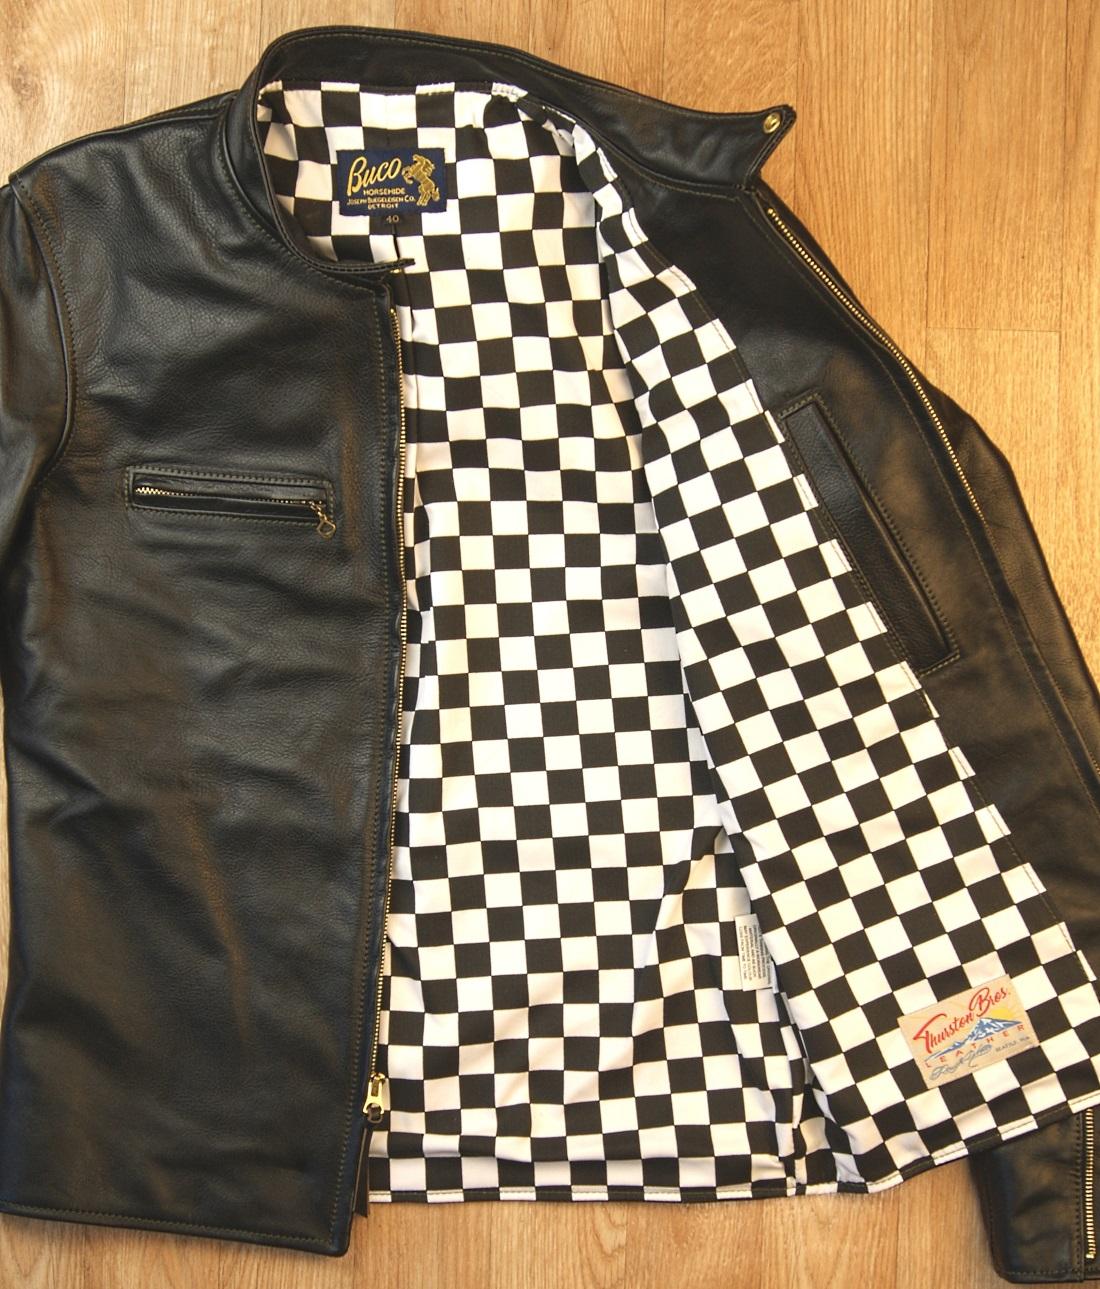 Aero Board Racer Blackened Brown Vicenza Horsehide ABD checkered cotton lining.jpg